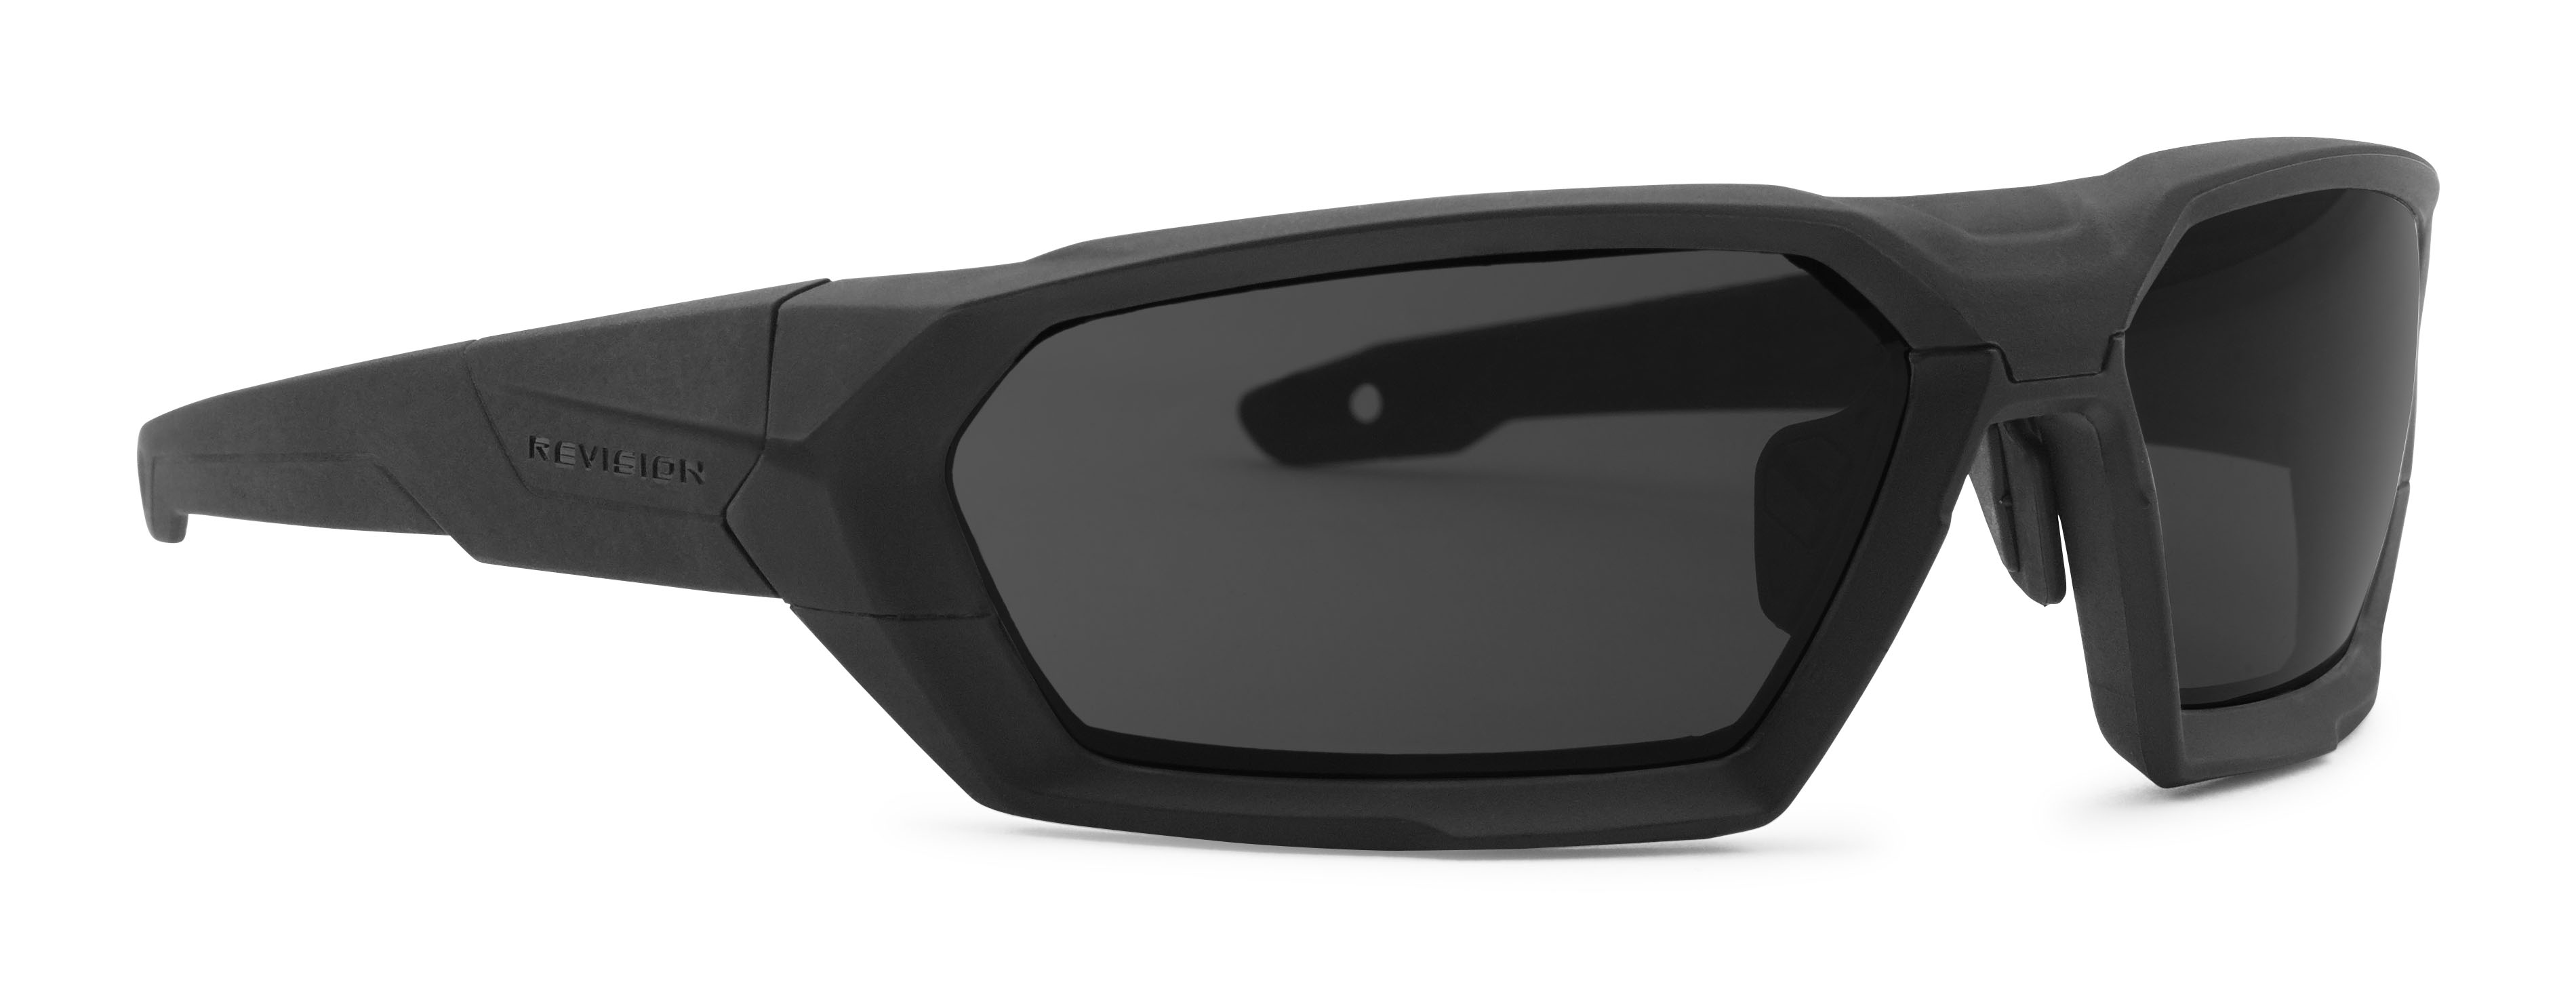 ShadowStrike APEL Ballistic Sunglasses